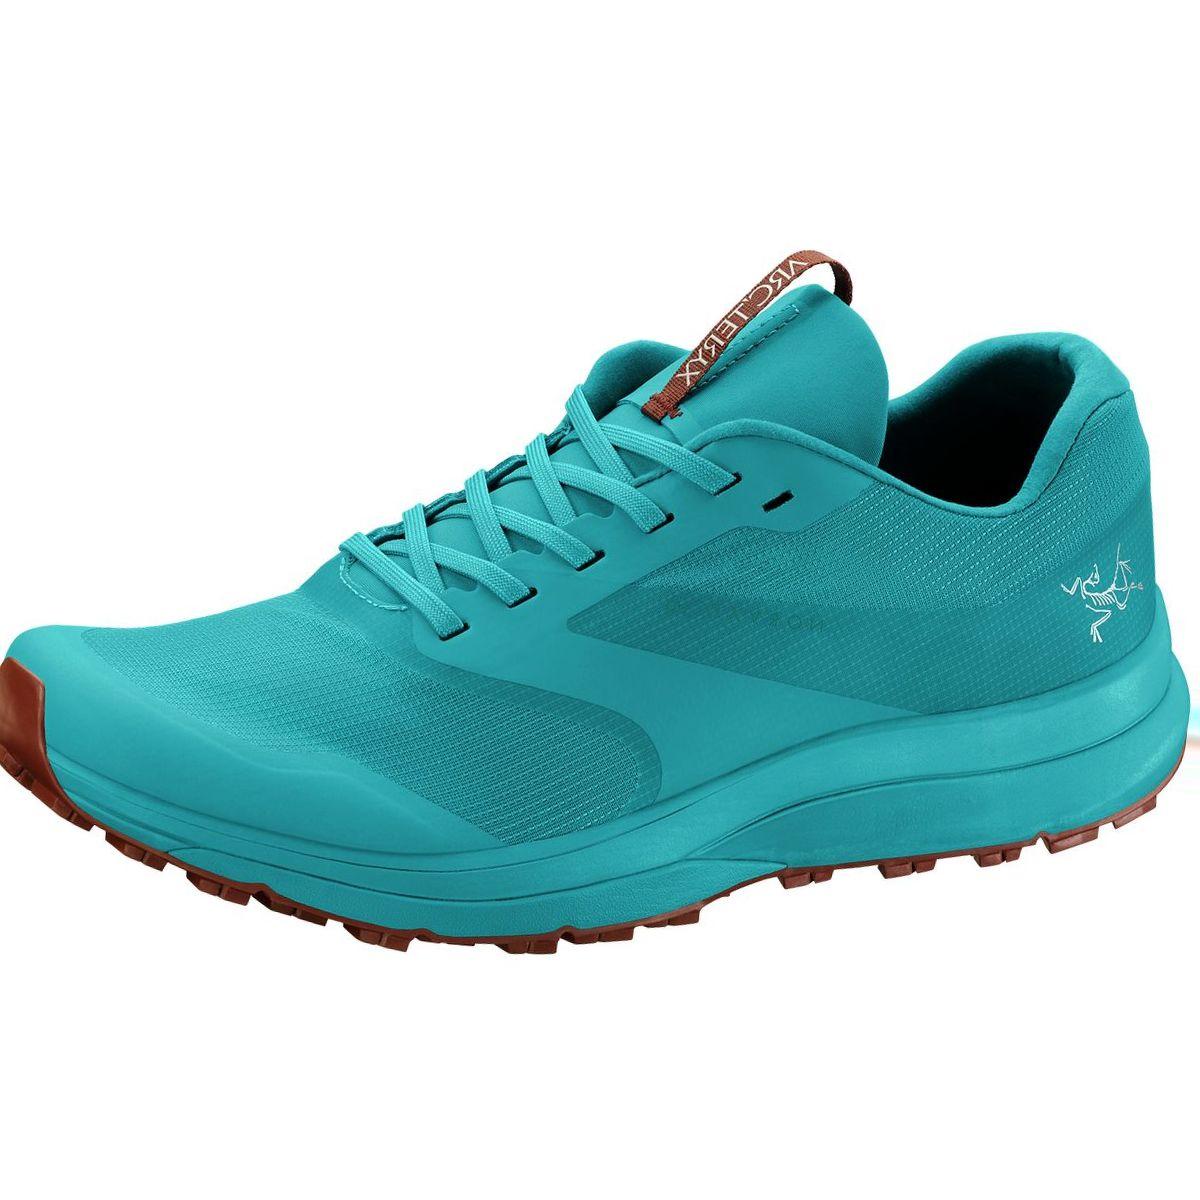 Arc'teryx Norvan LD Trail Running Shoe - Men's